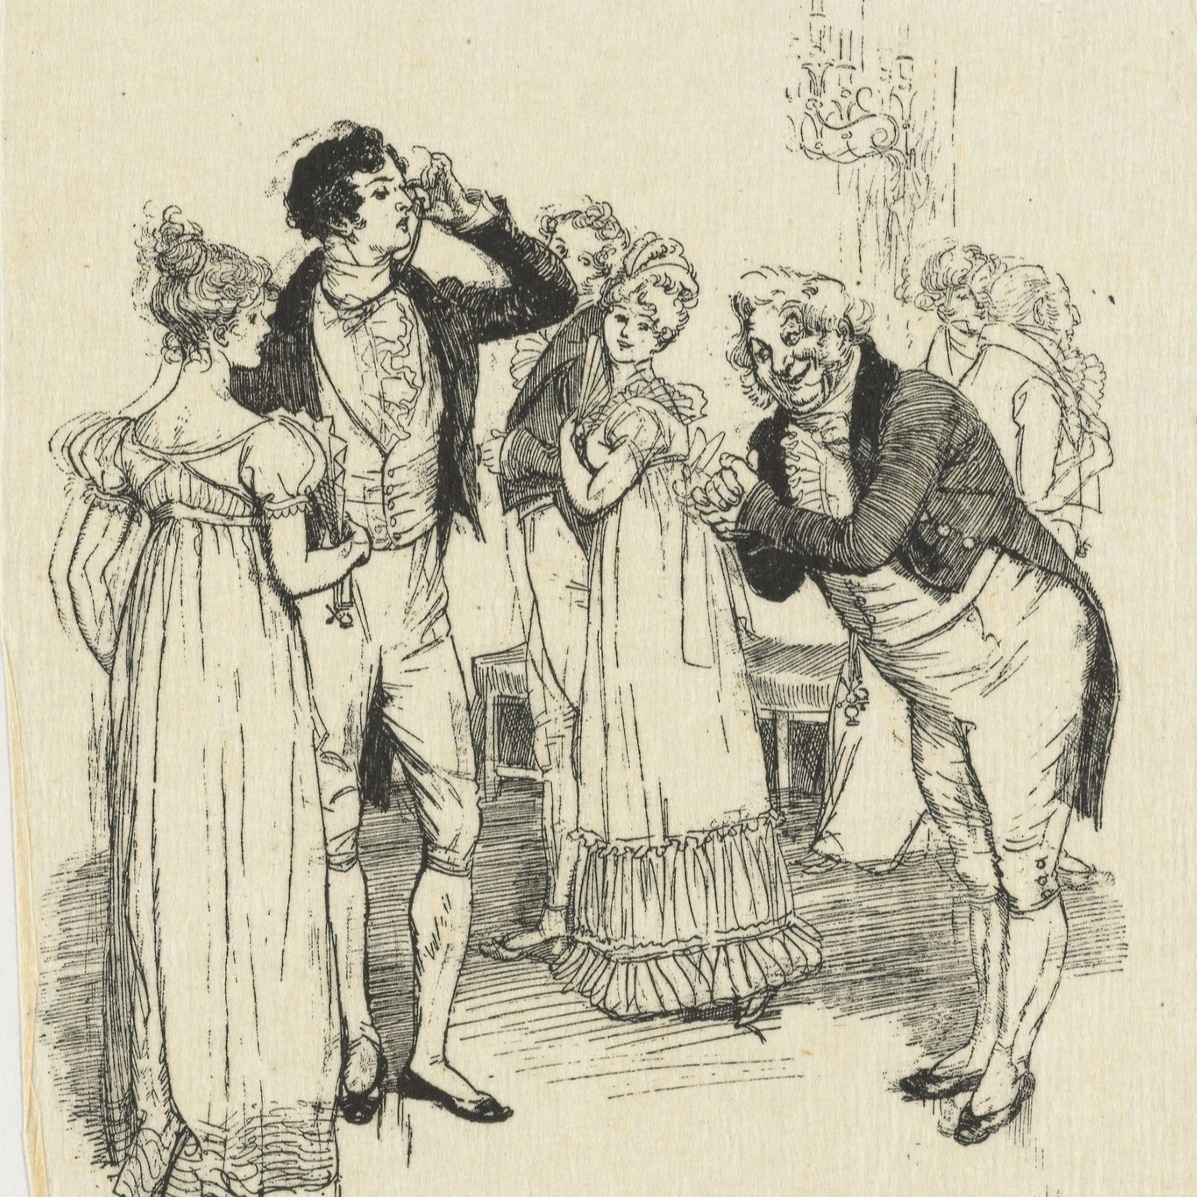 Houghton_Typ_805.94.8320_-_Pride_and_Prejudice%2C_1894%2C_Hugh_Thomson_-_superior_dancing.jpg